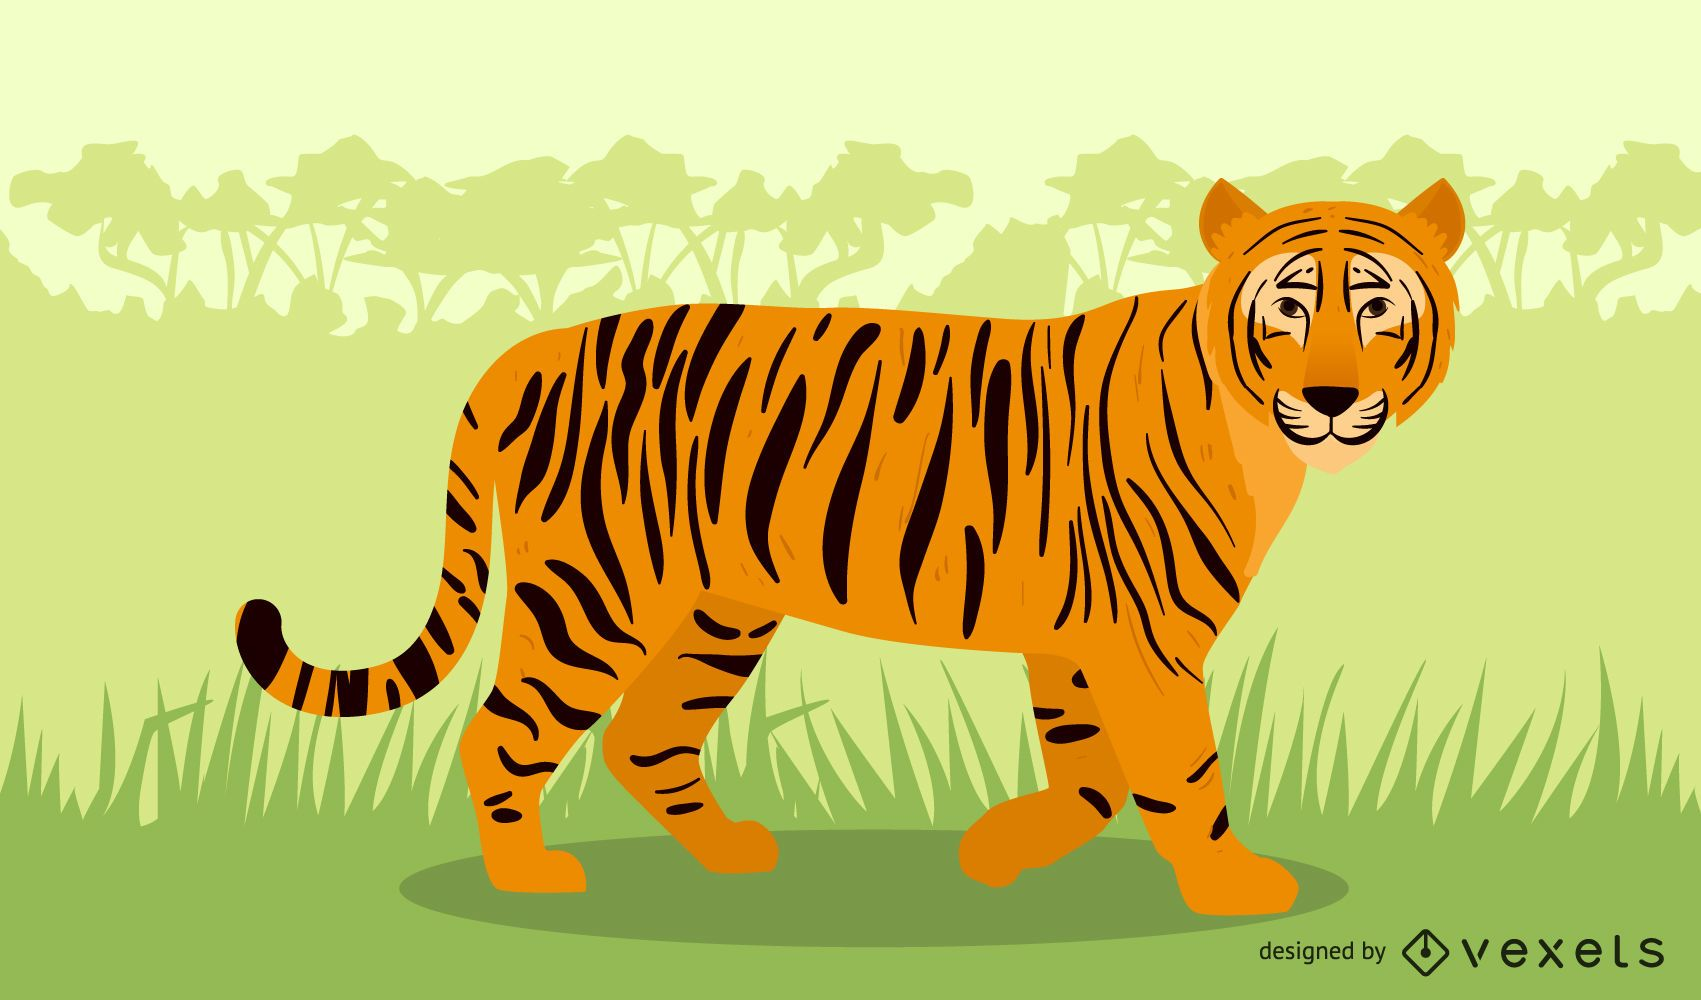 tiger in the wild illustration